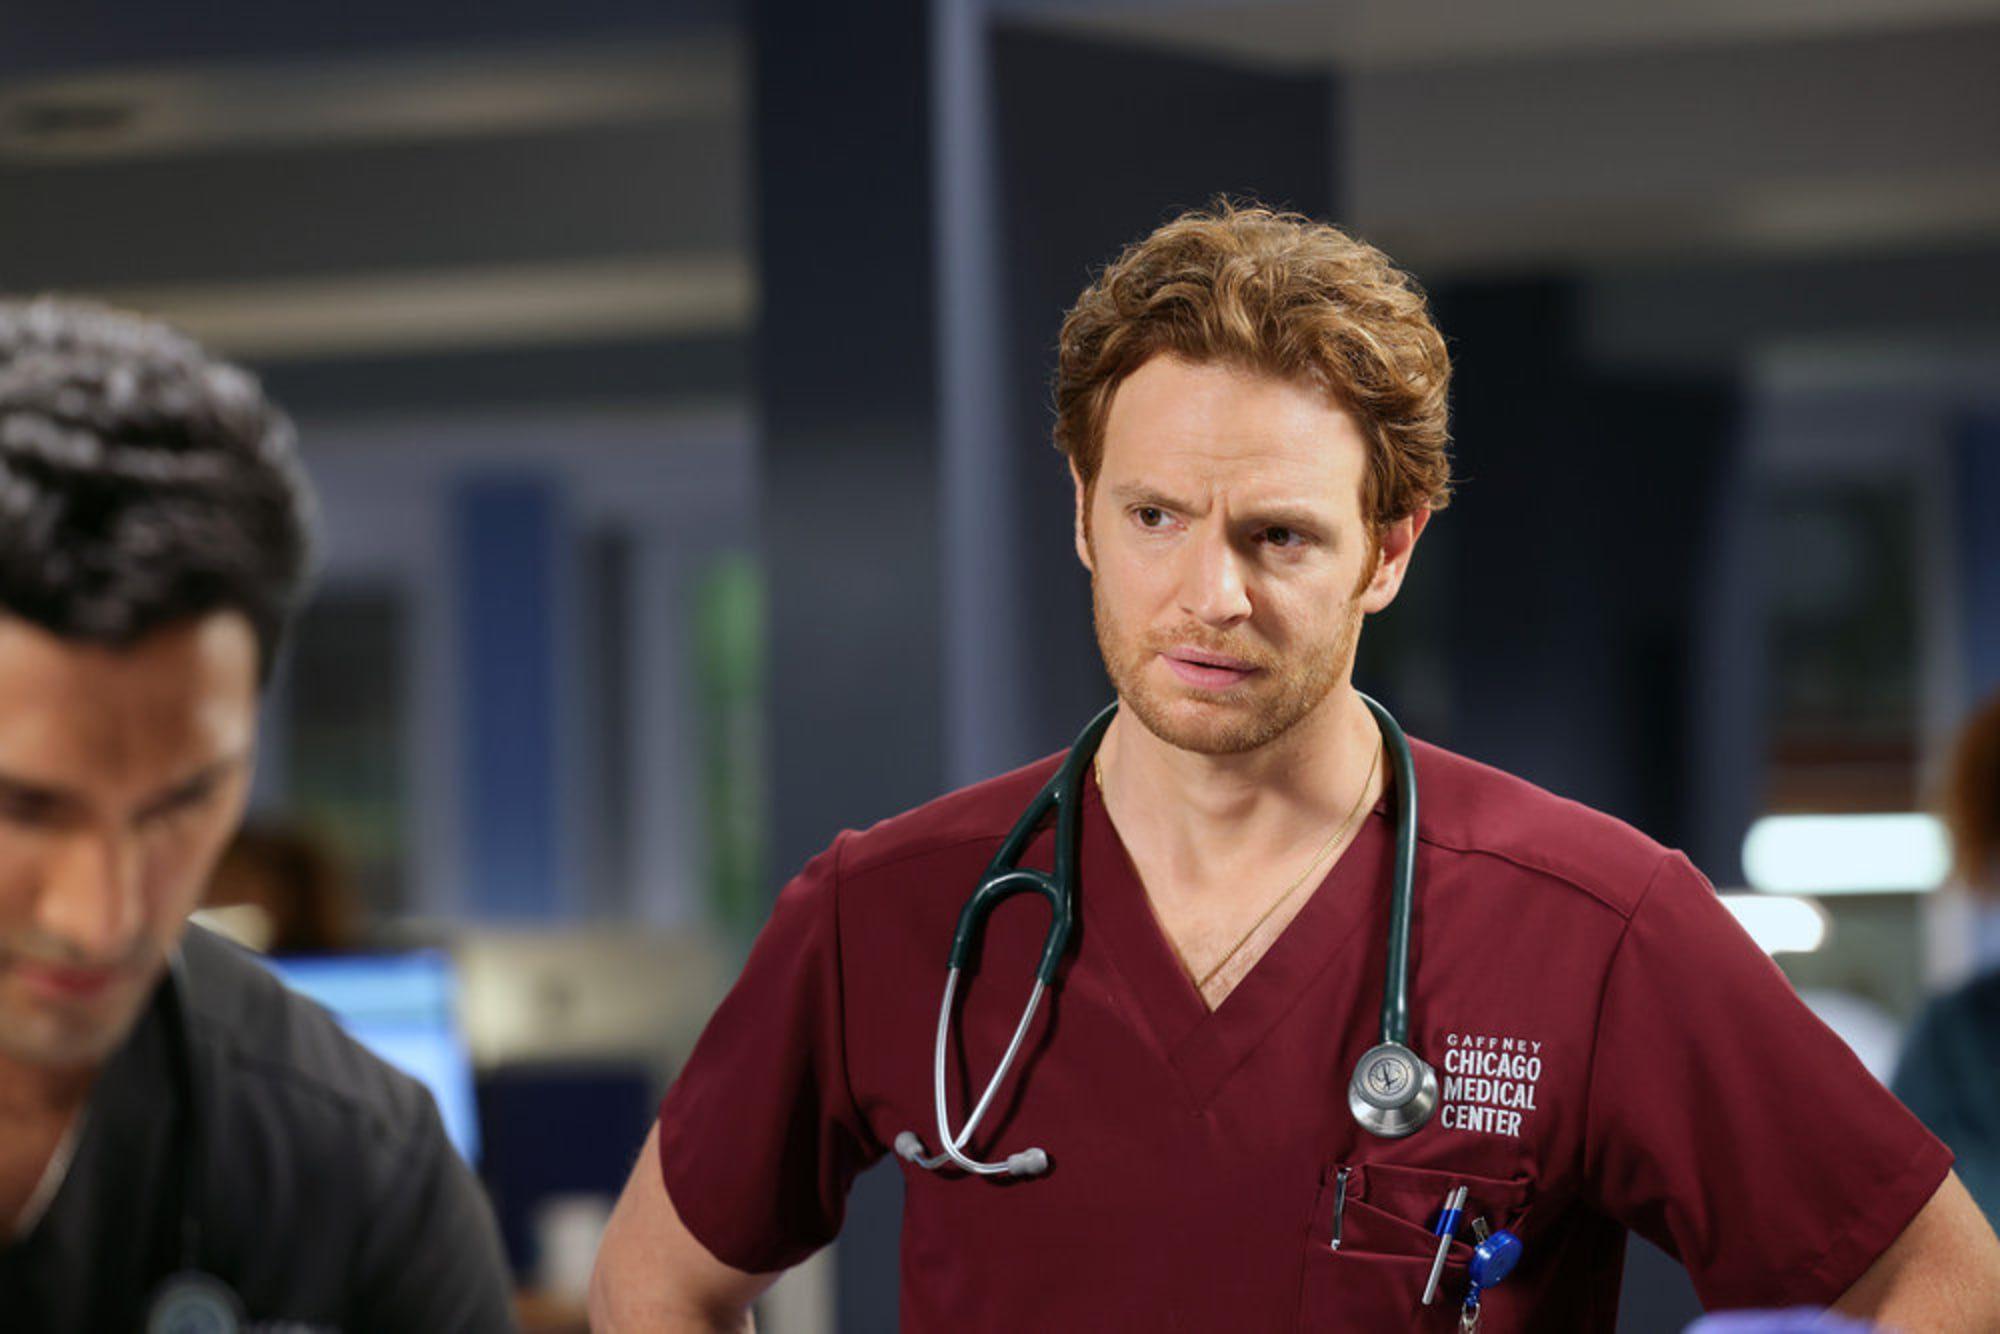 Chicago Med Season 7 Episode 1